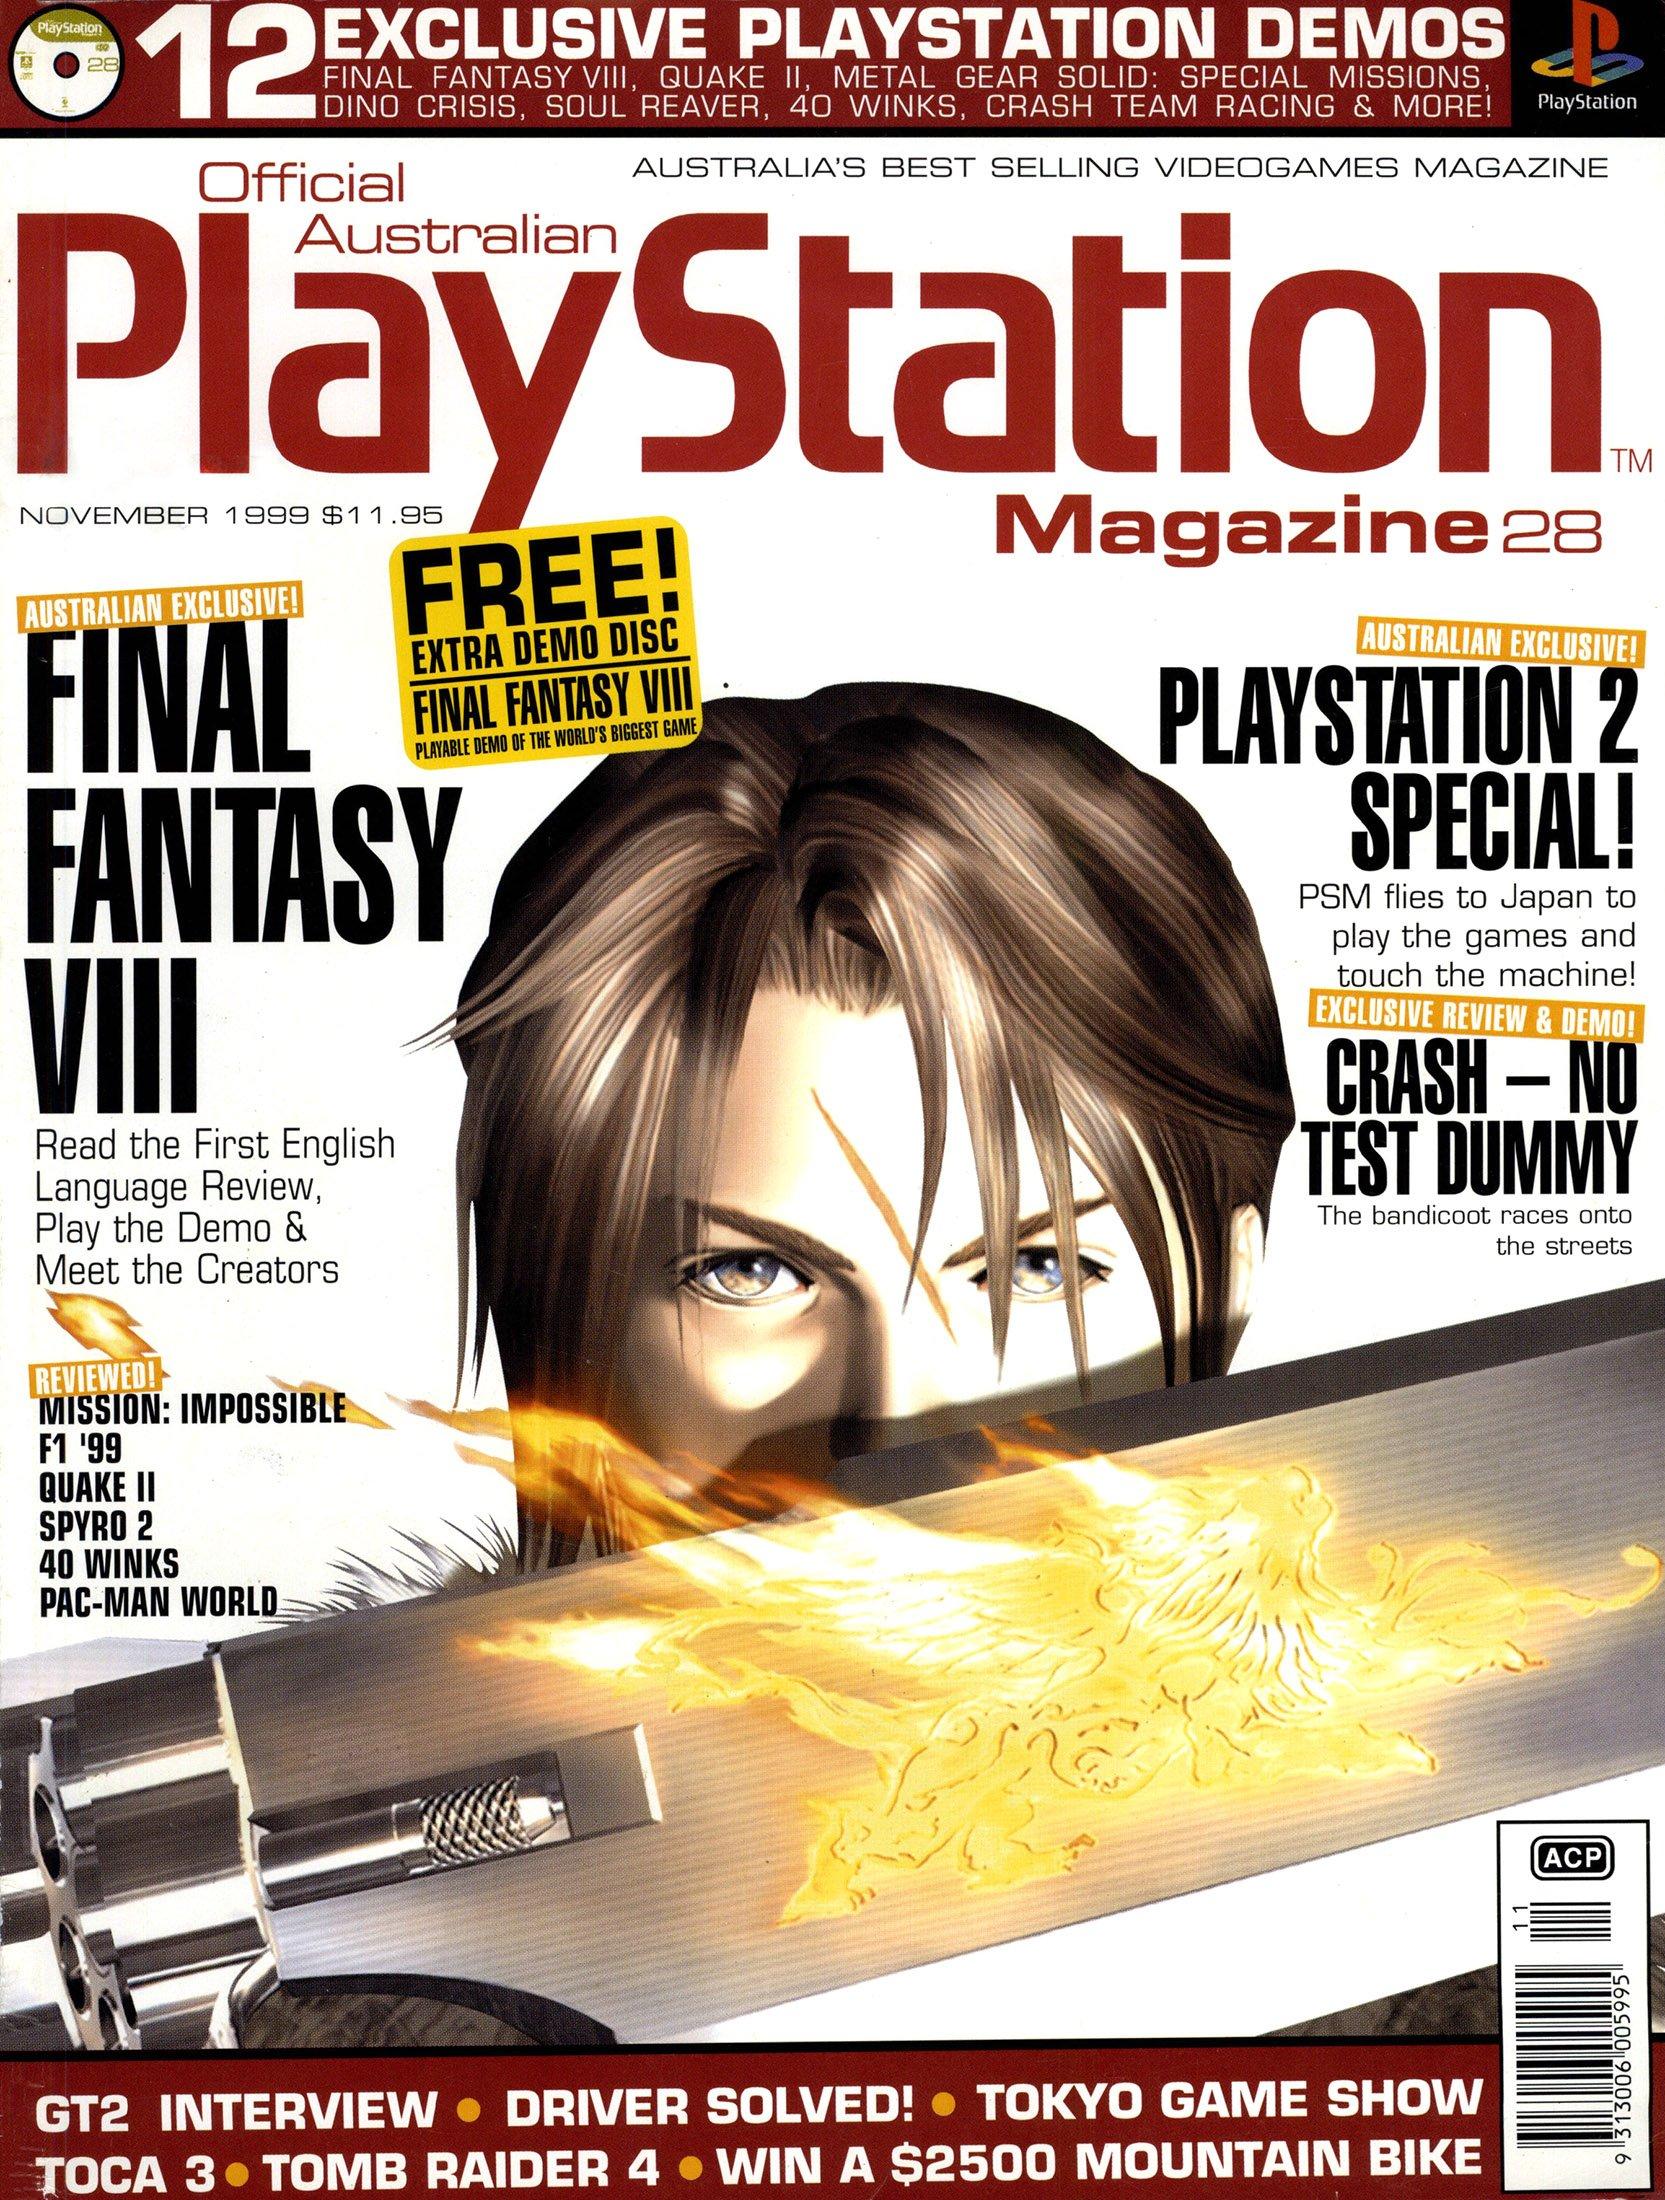 Official Australian PlayStation Magazine 028 (November 1999)